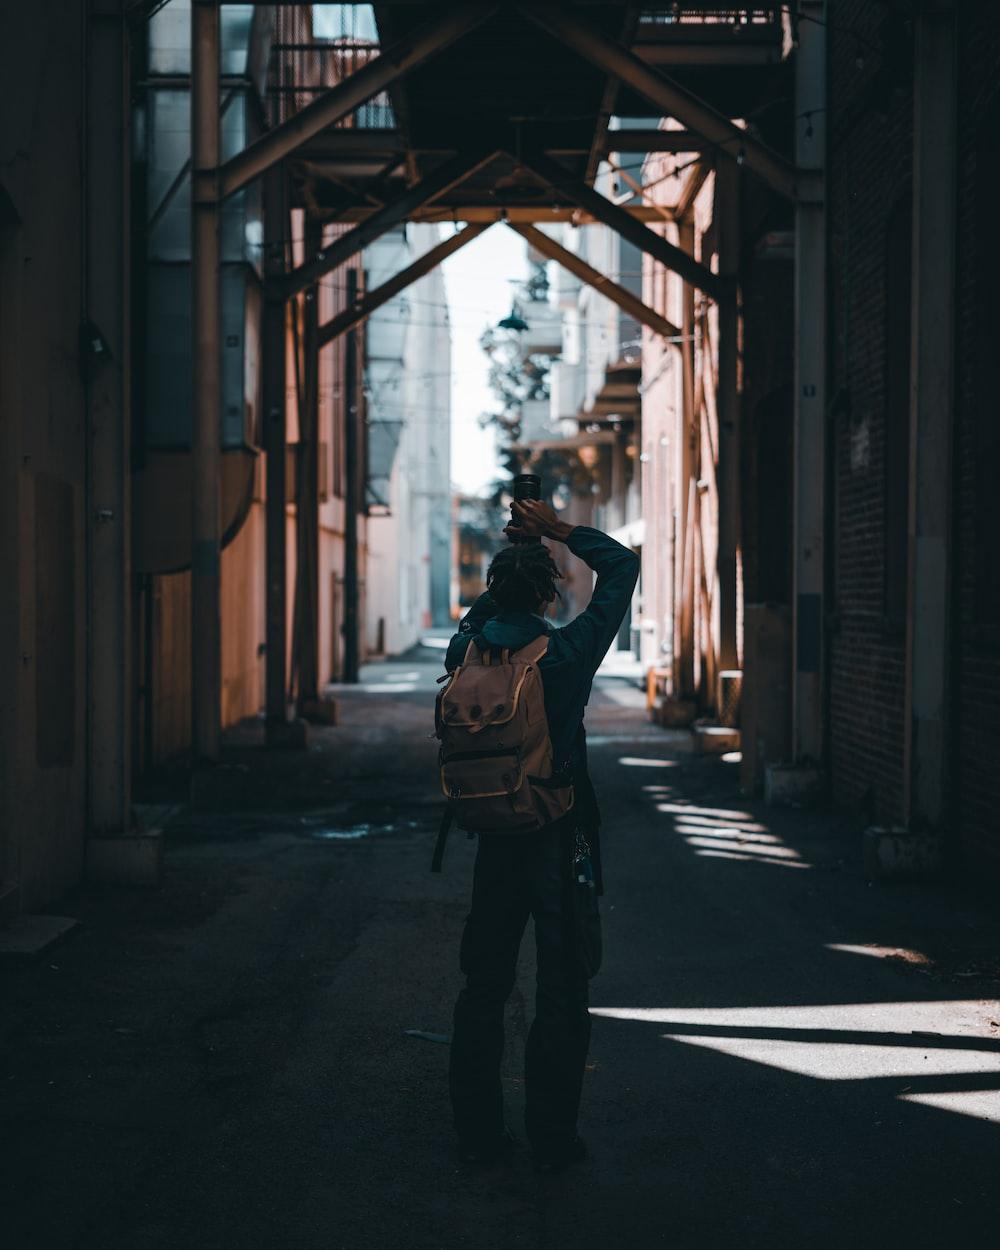 woman in black jacket standing on hallway